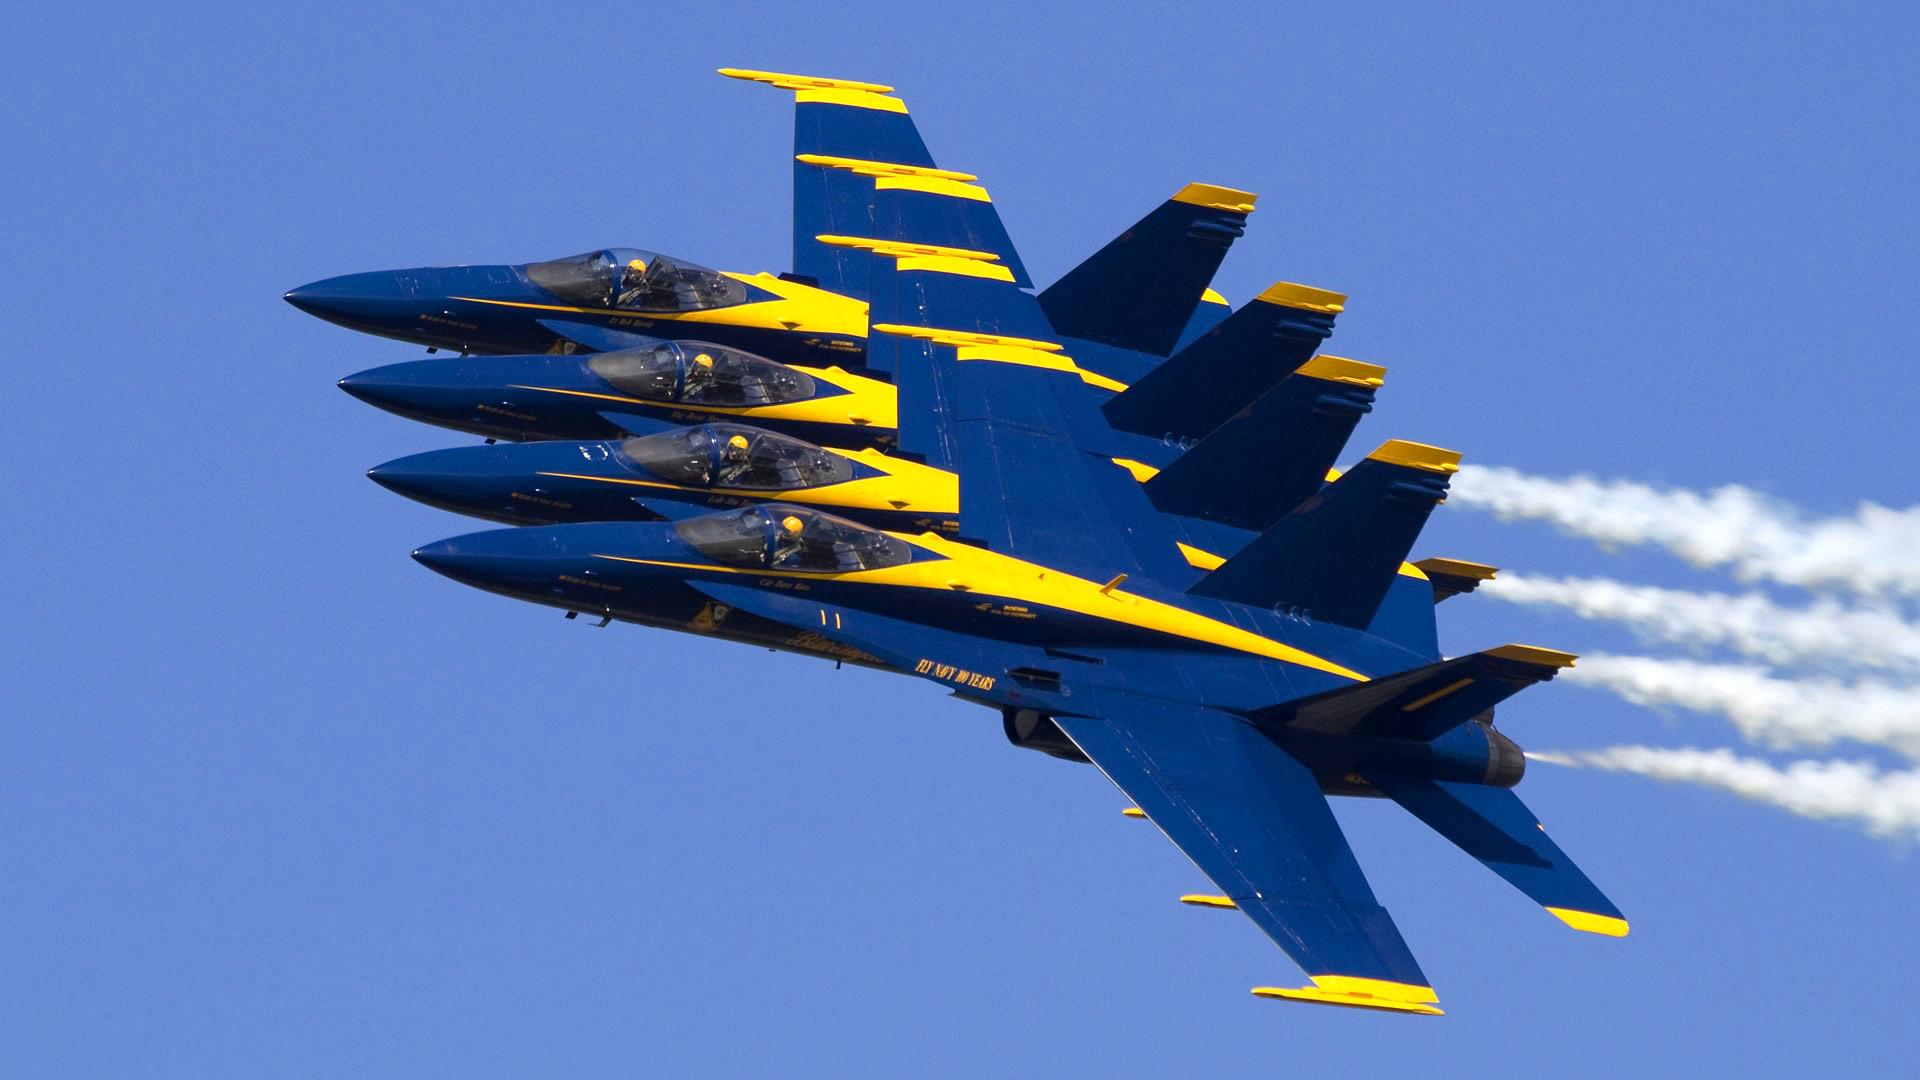 Sfondi Cielo Veicolo Blu Aerei Militari Sukhoi Su 27